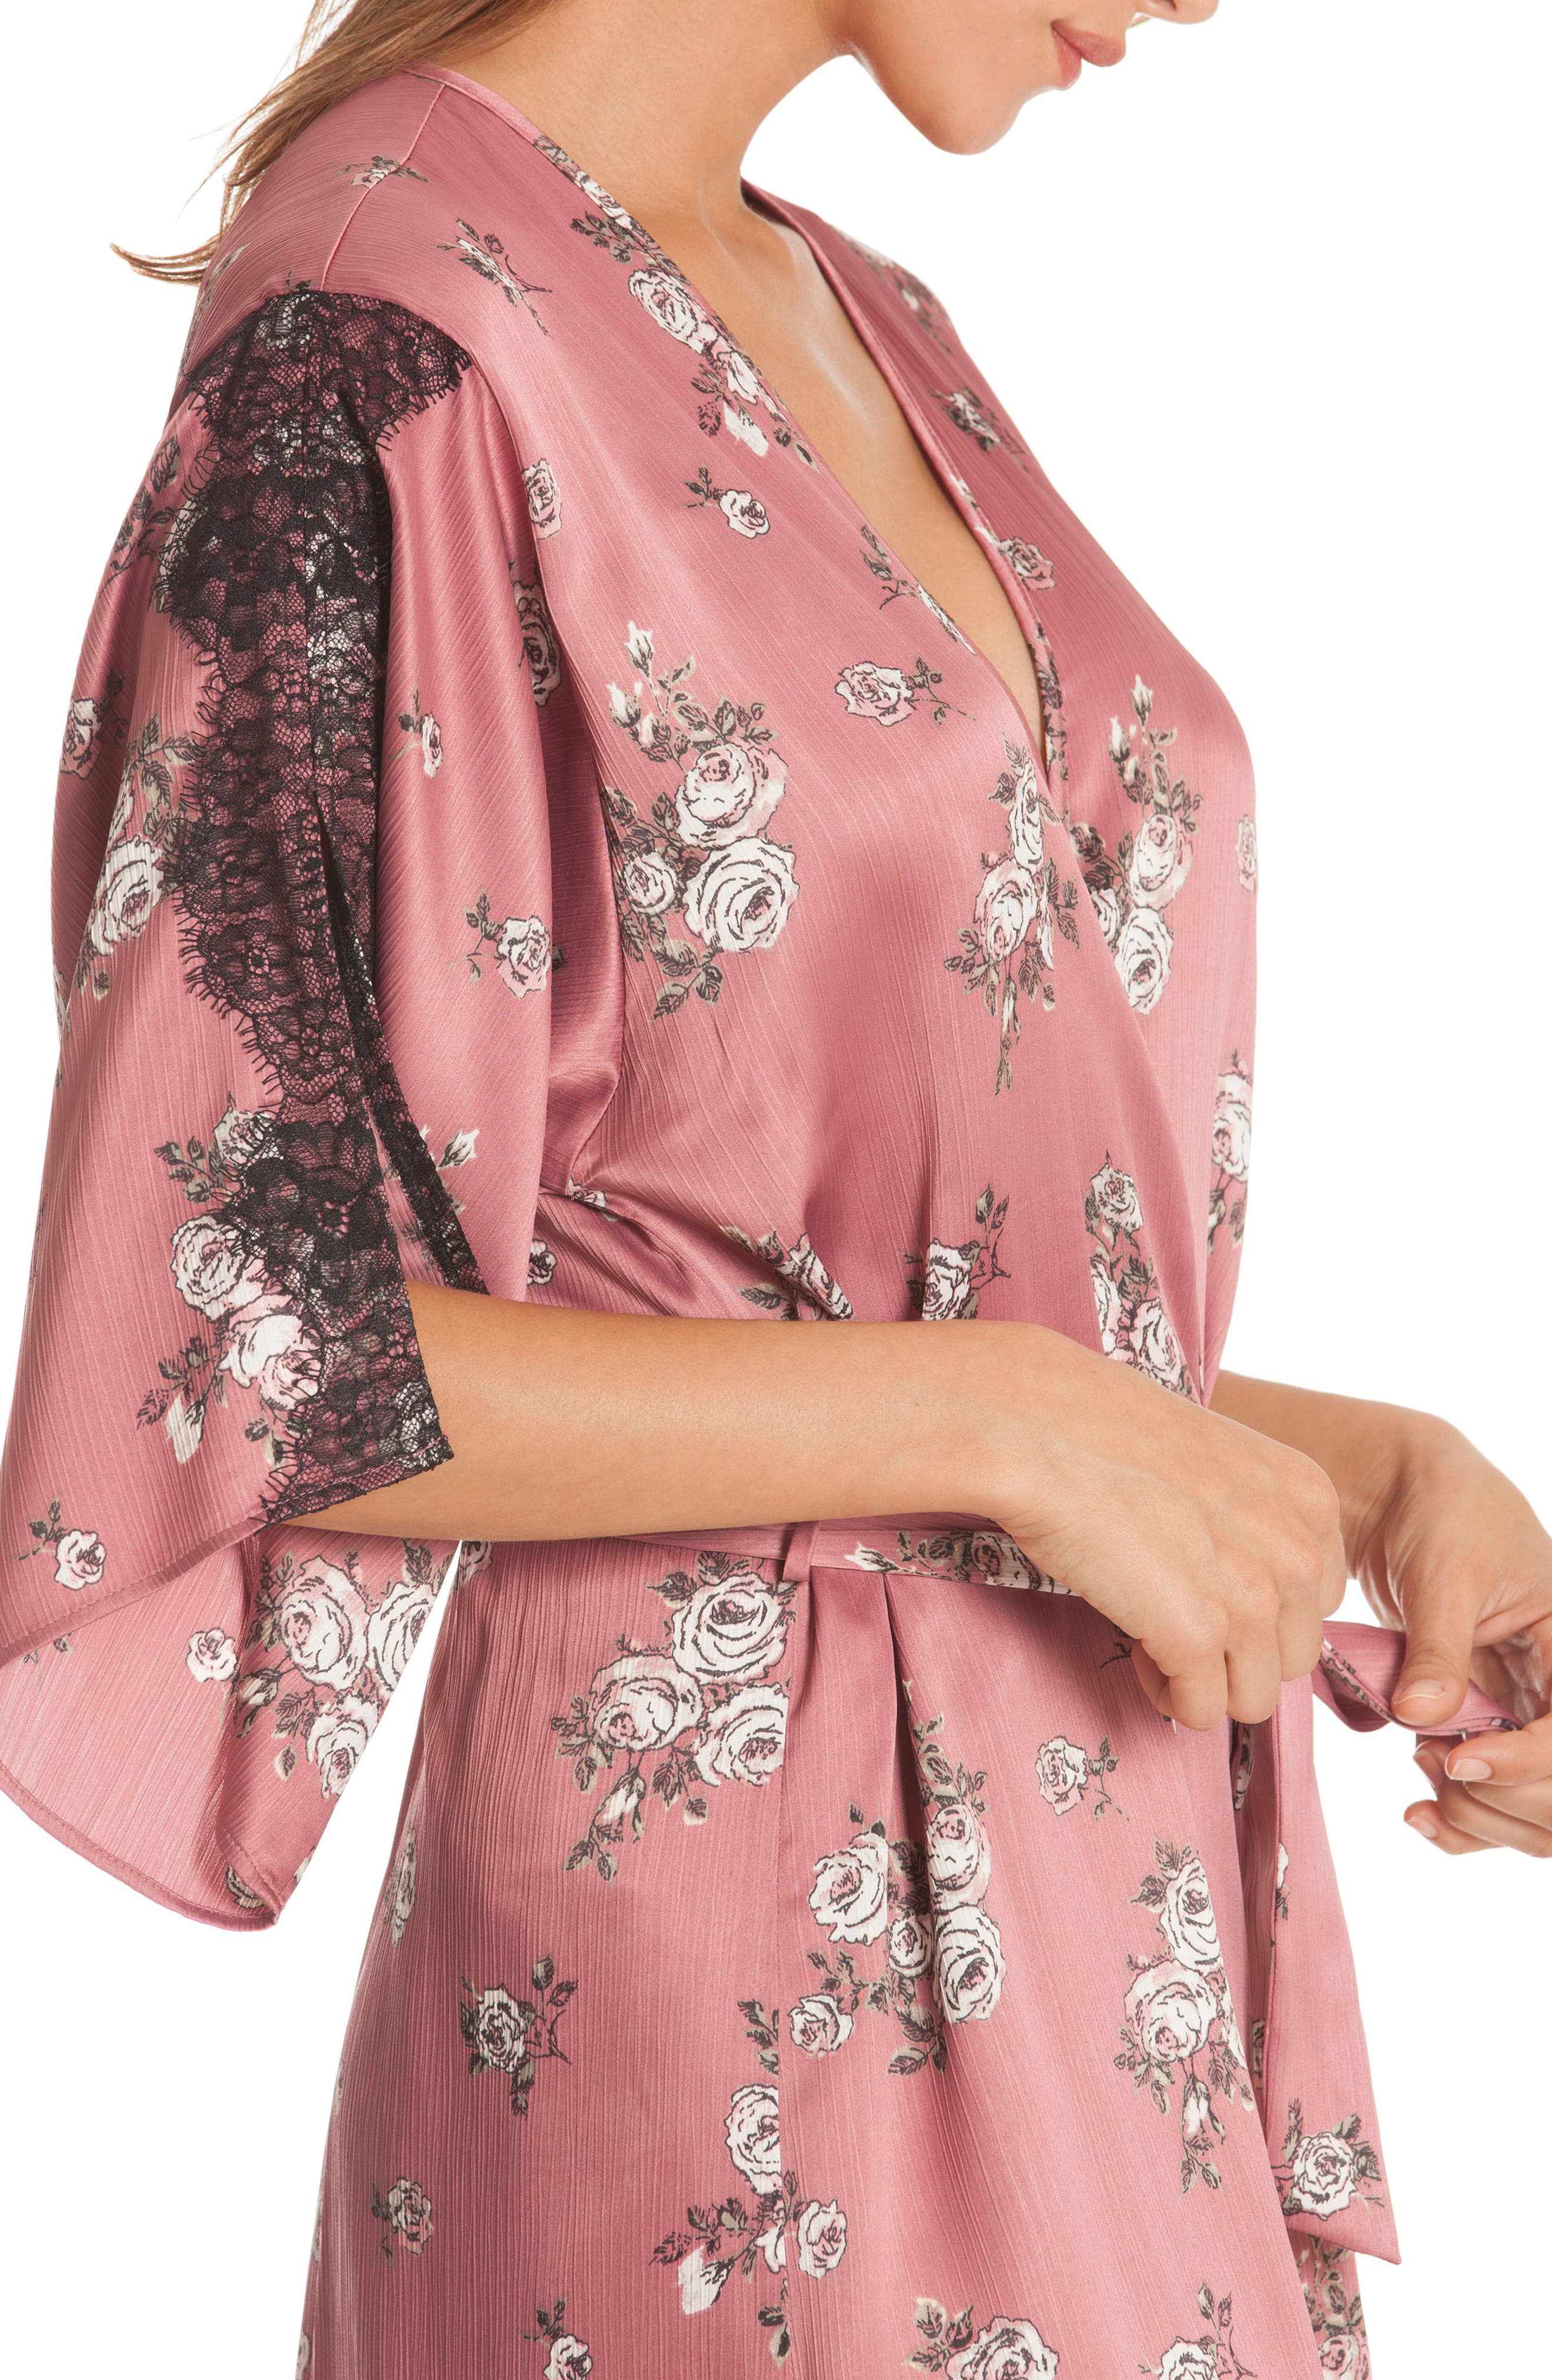 Tegan Kimono Wrap,                             Alternate thumbnail 4, color,                             ROSE